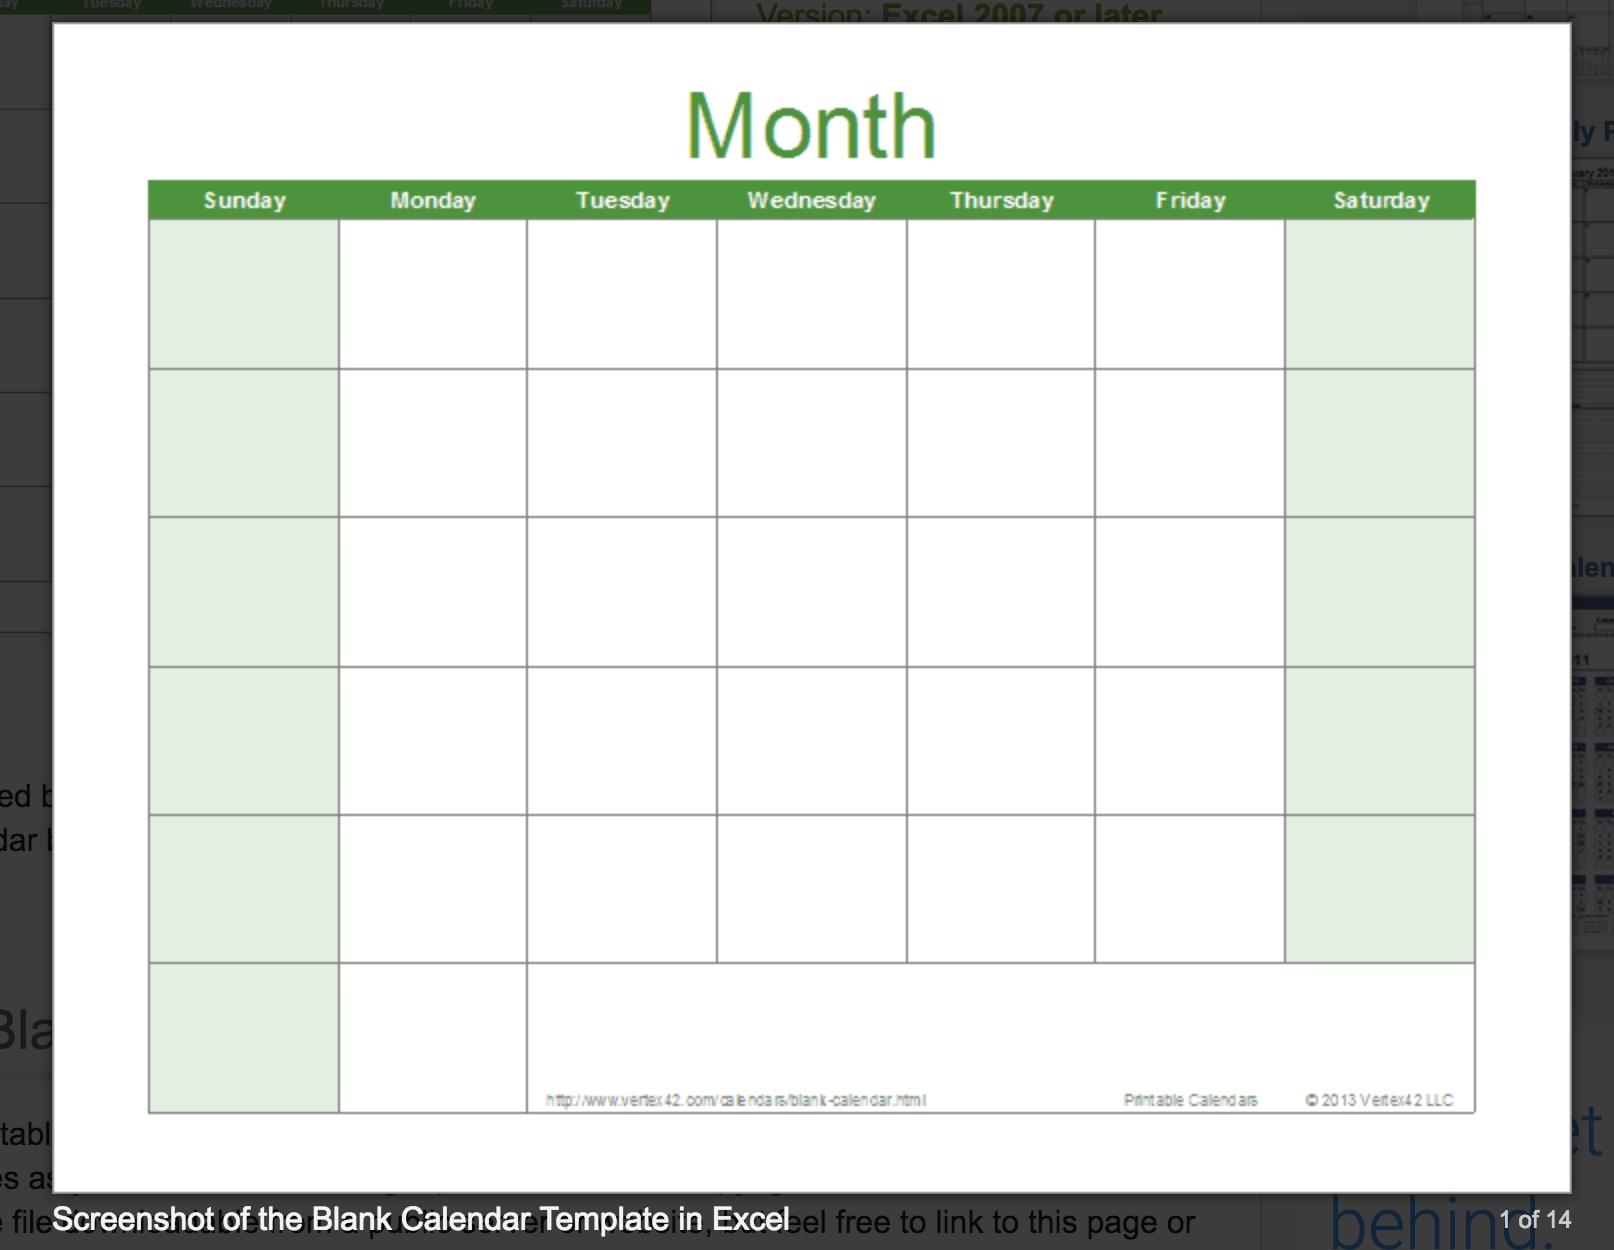 Blank Calendar: Wonderfully Printable 2019 Templates-Printable Blank Monthly Calendar Template